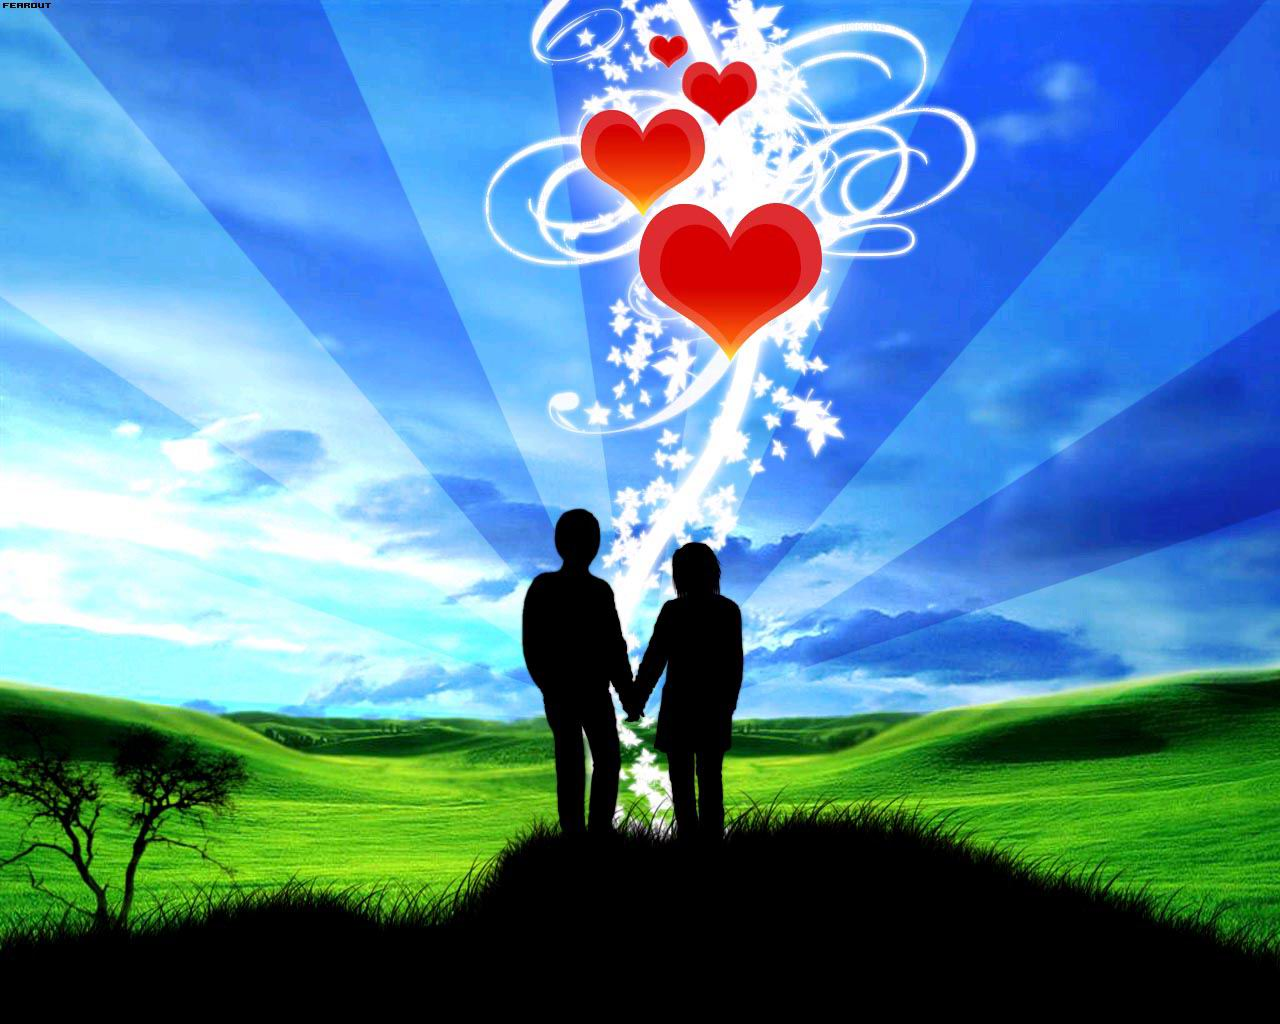 Gambar Romantis Animasi Kartun Kata Cinta - Gambar Foto